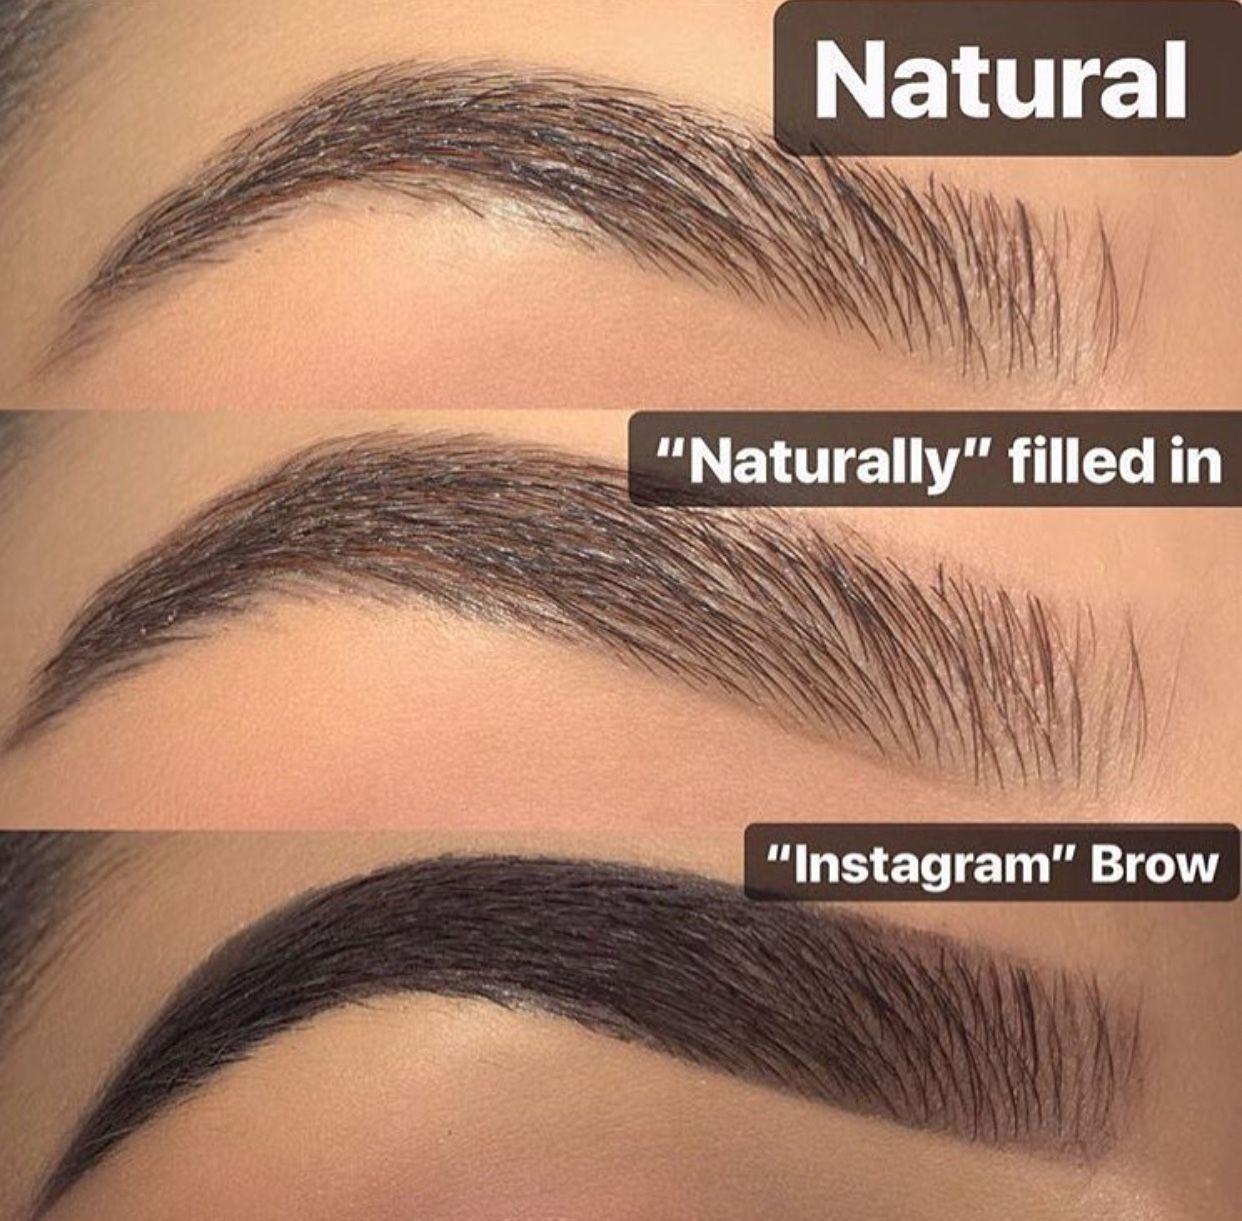 Natural Eyebrows   Brow Tutorial   Instagram Eyebrows   Filled in Brows   Fleeky Brows   Brows on fleek #eyebrows #brows #browsonfleek #eyebrowsonfleek Pin: @amerishabeauty #EyebrowsMicroblading #naturalbrows